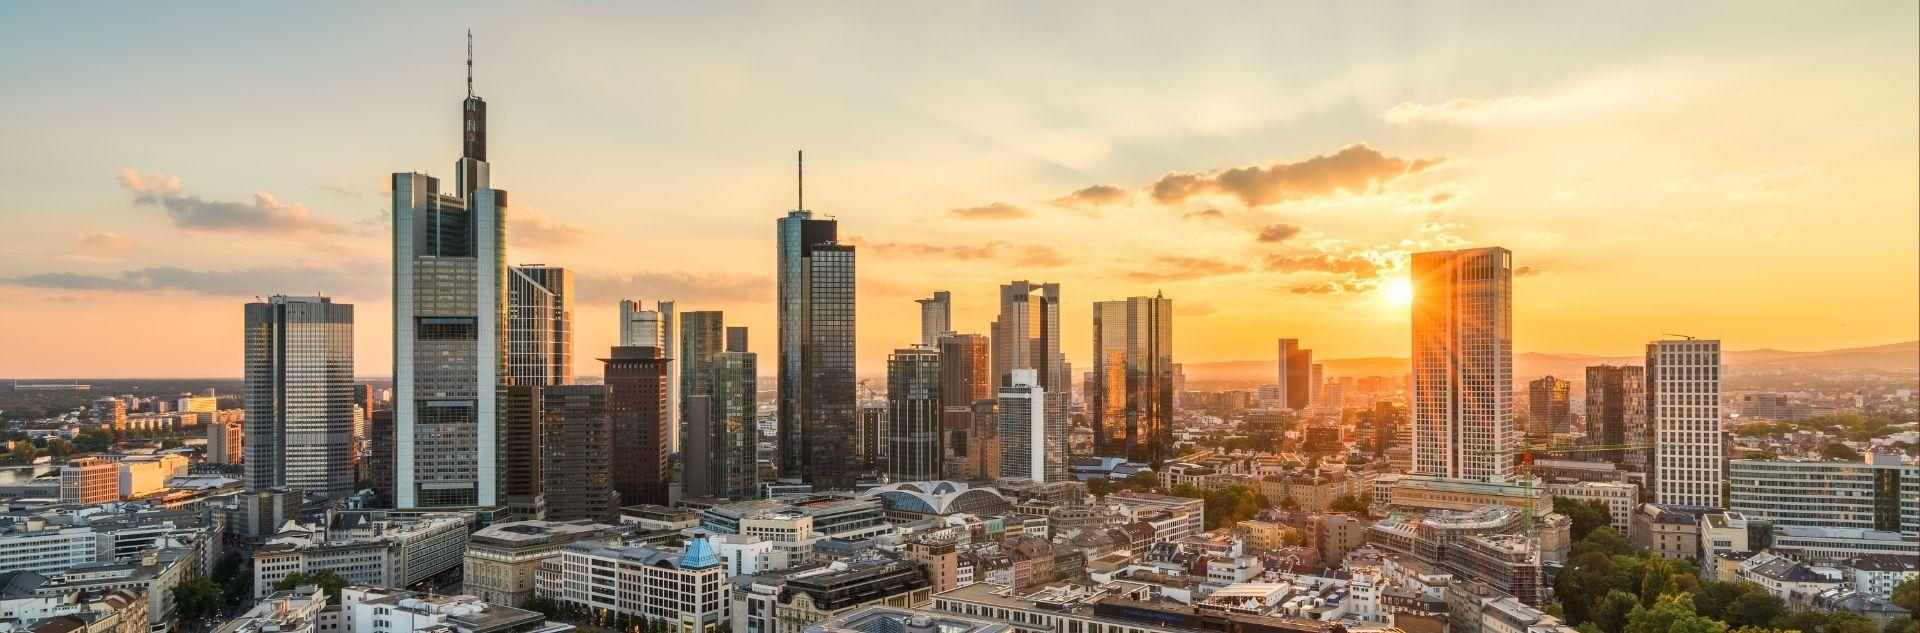 Stadtansicht Frankfurt - Reisebüro Frankfurt